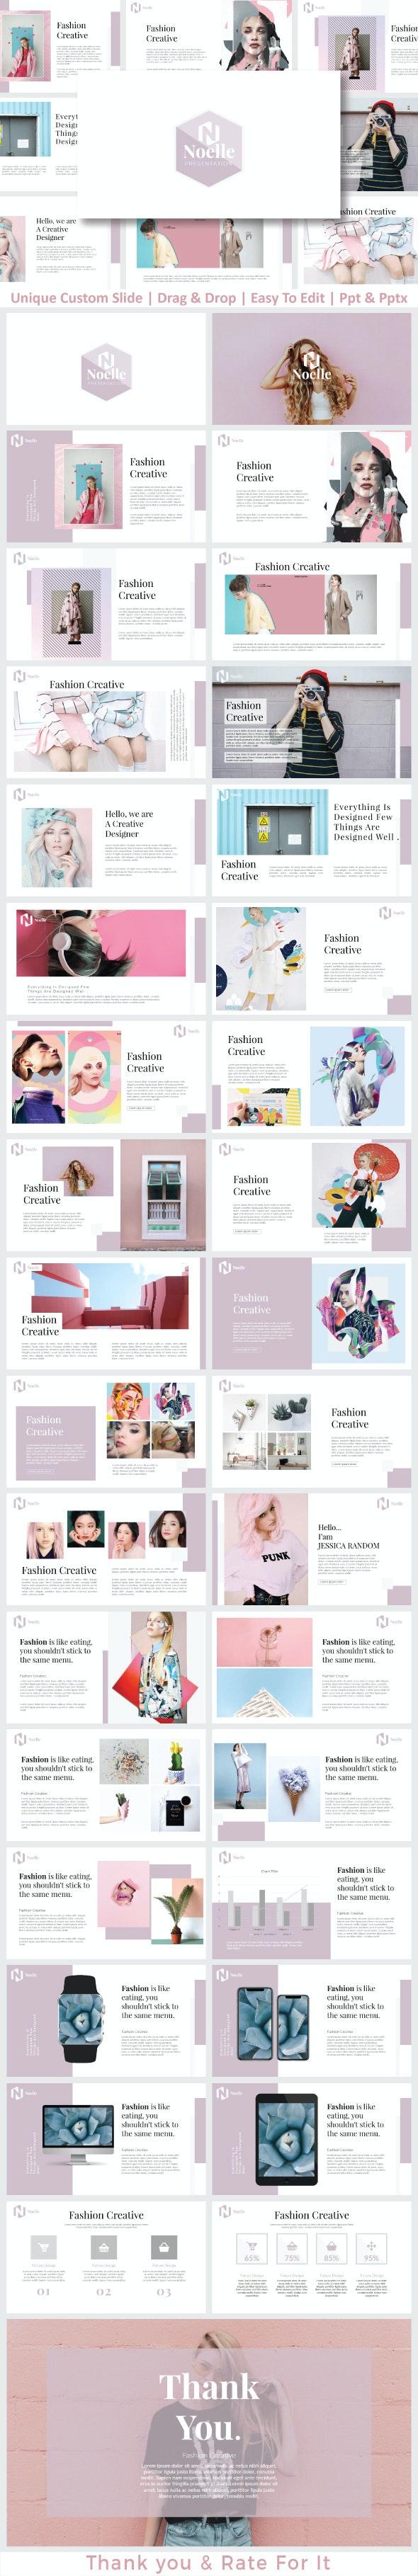 Noelle Presentation Templates - Creative PowerPoint Templates